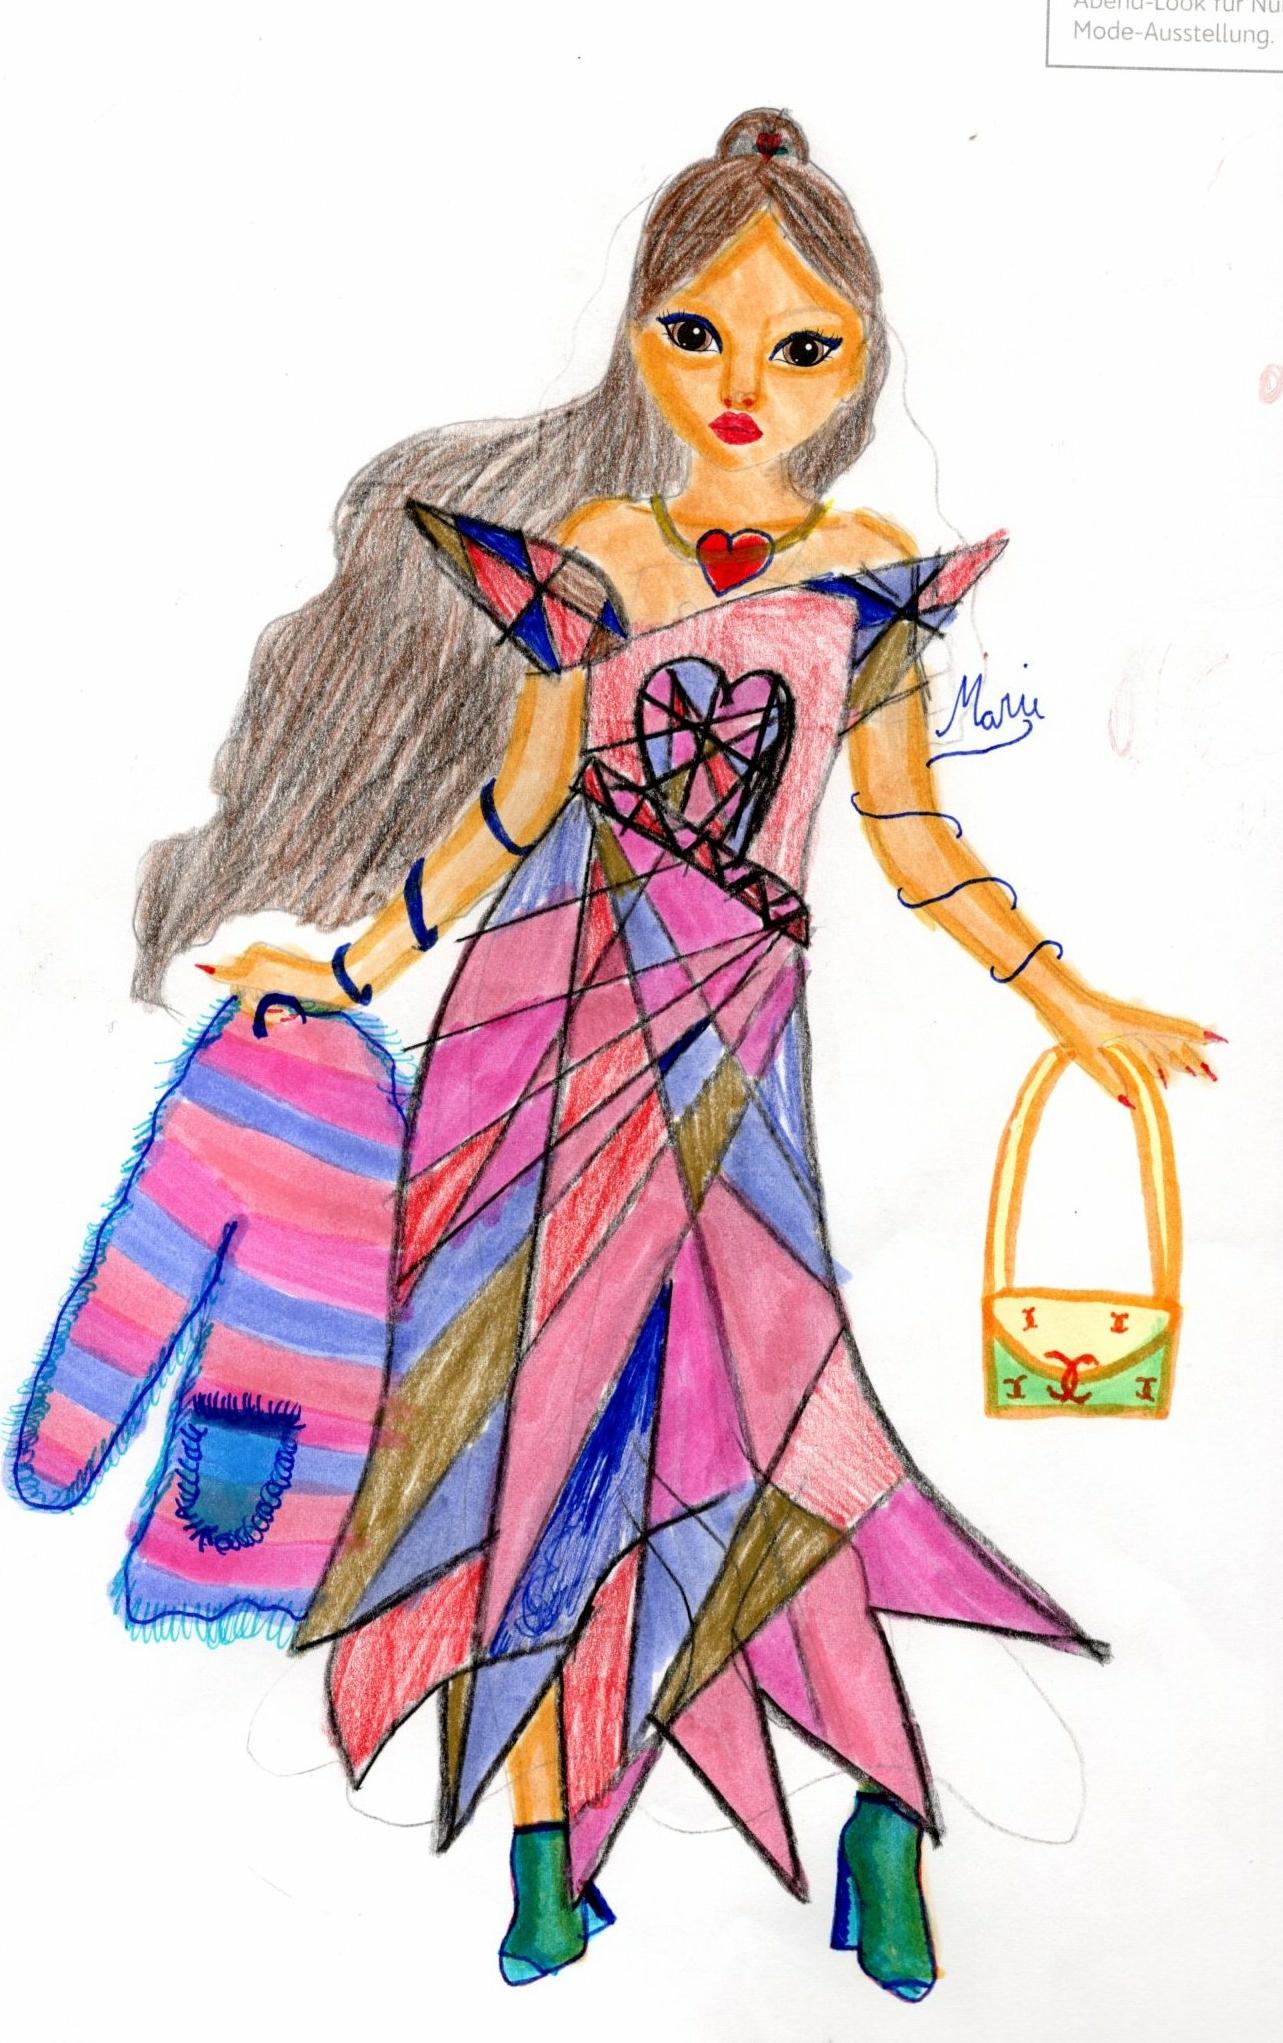 Marie-Christin M., 10 Jahre, aus Oberndorf